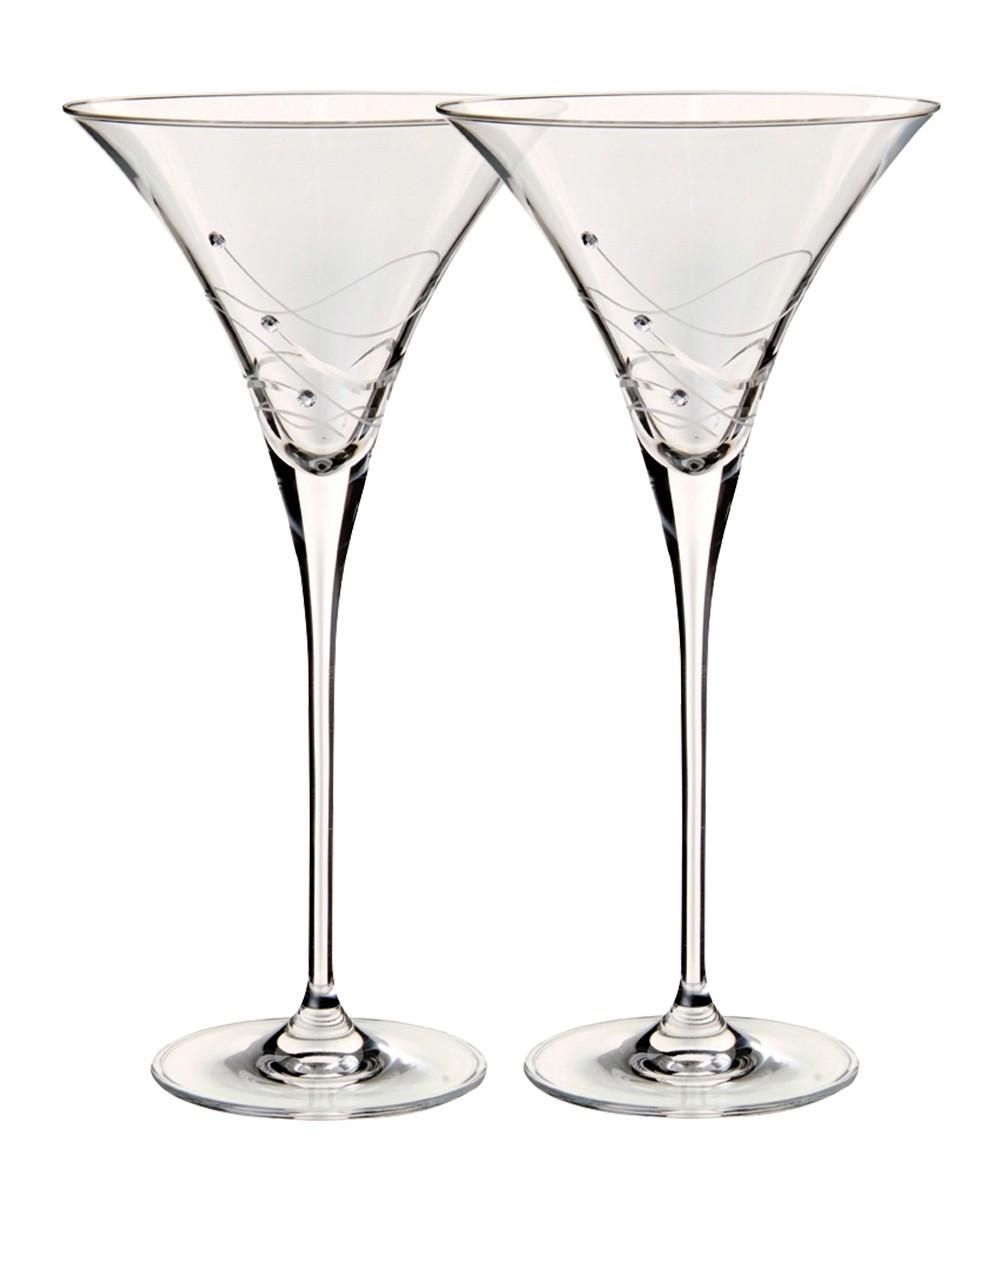 1000x1278 Dartington Glitz Martini Cocktail Glasses Buy Online Or Send As